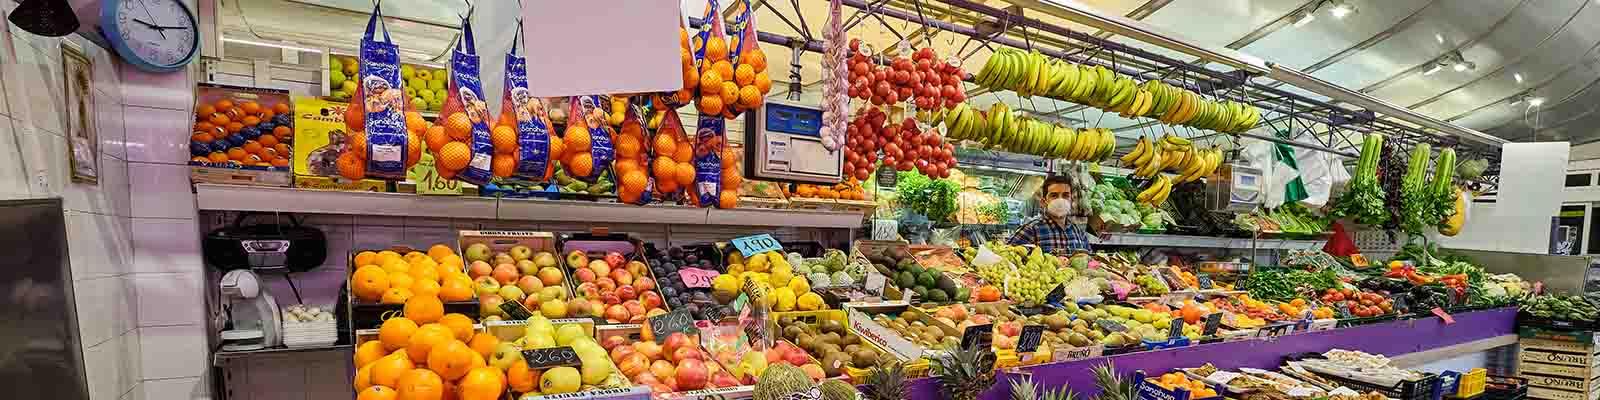 FRUITES VERDURES I HORTALISSES SOLE